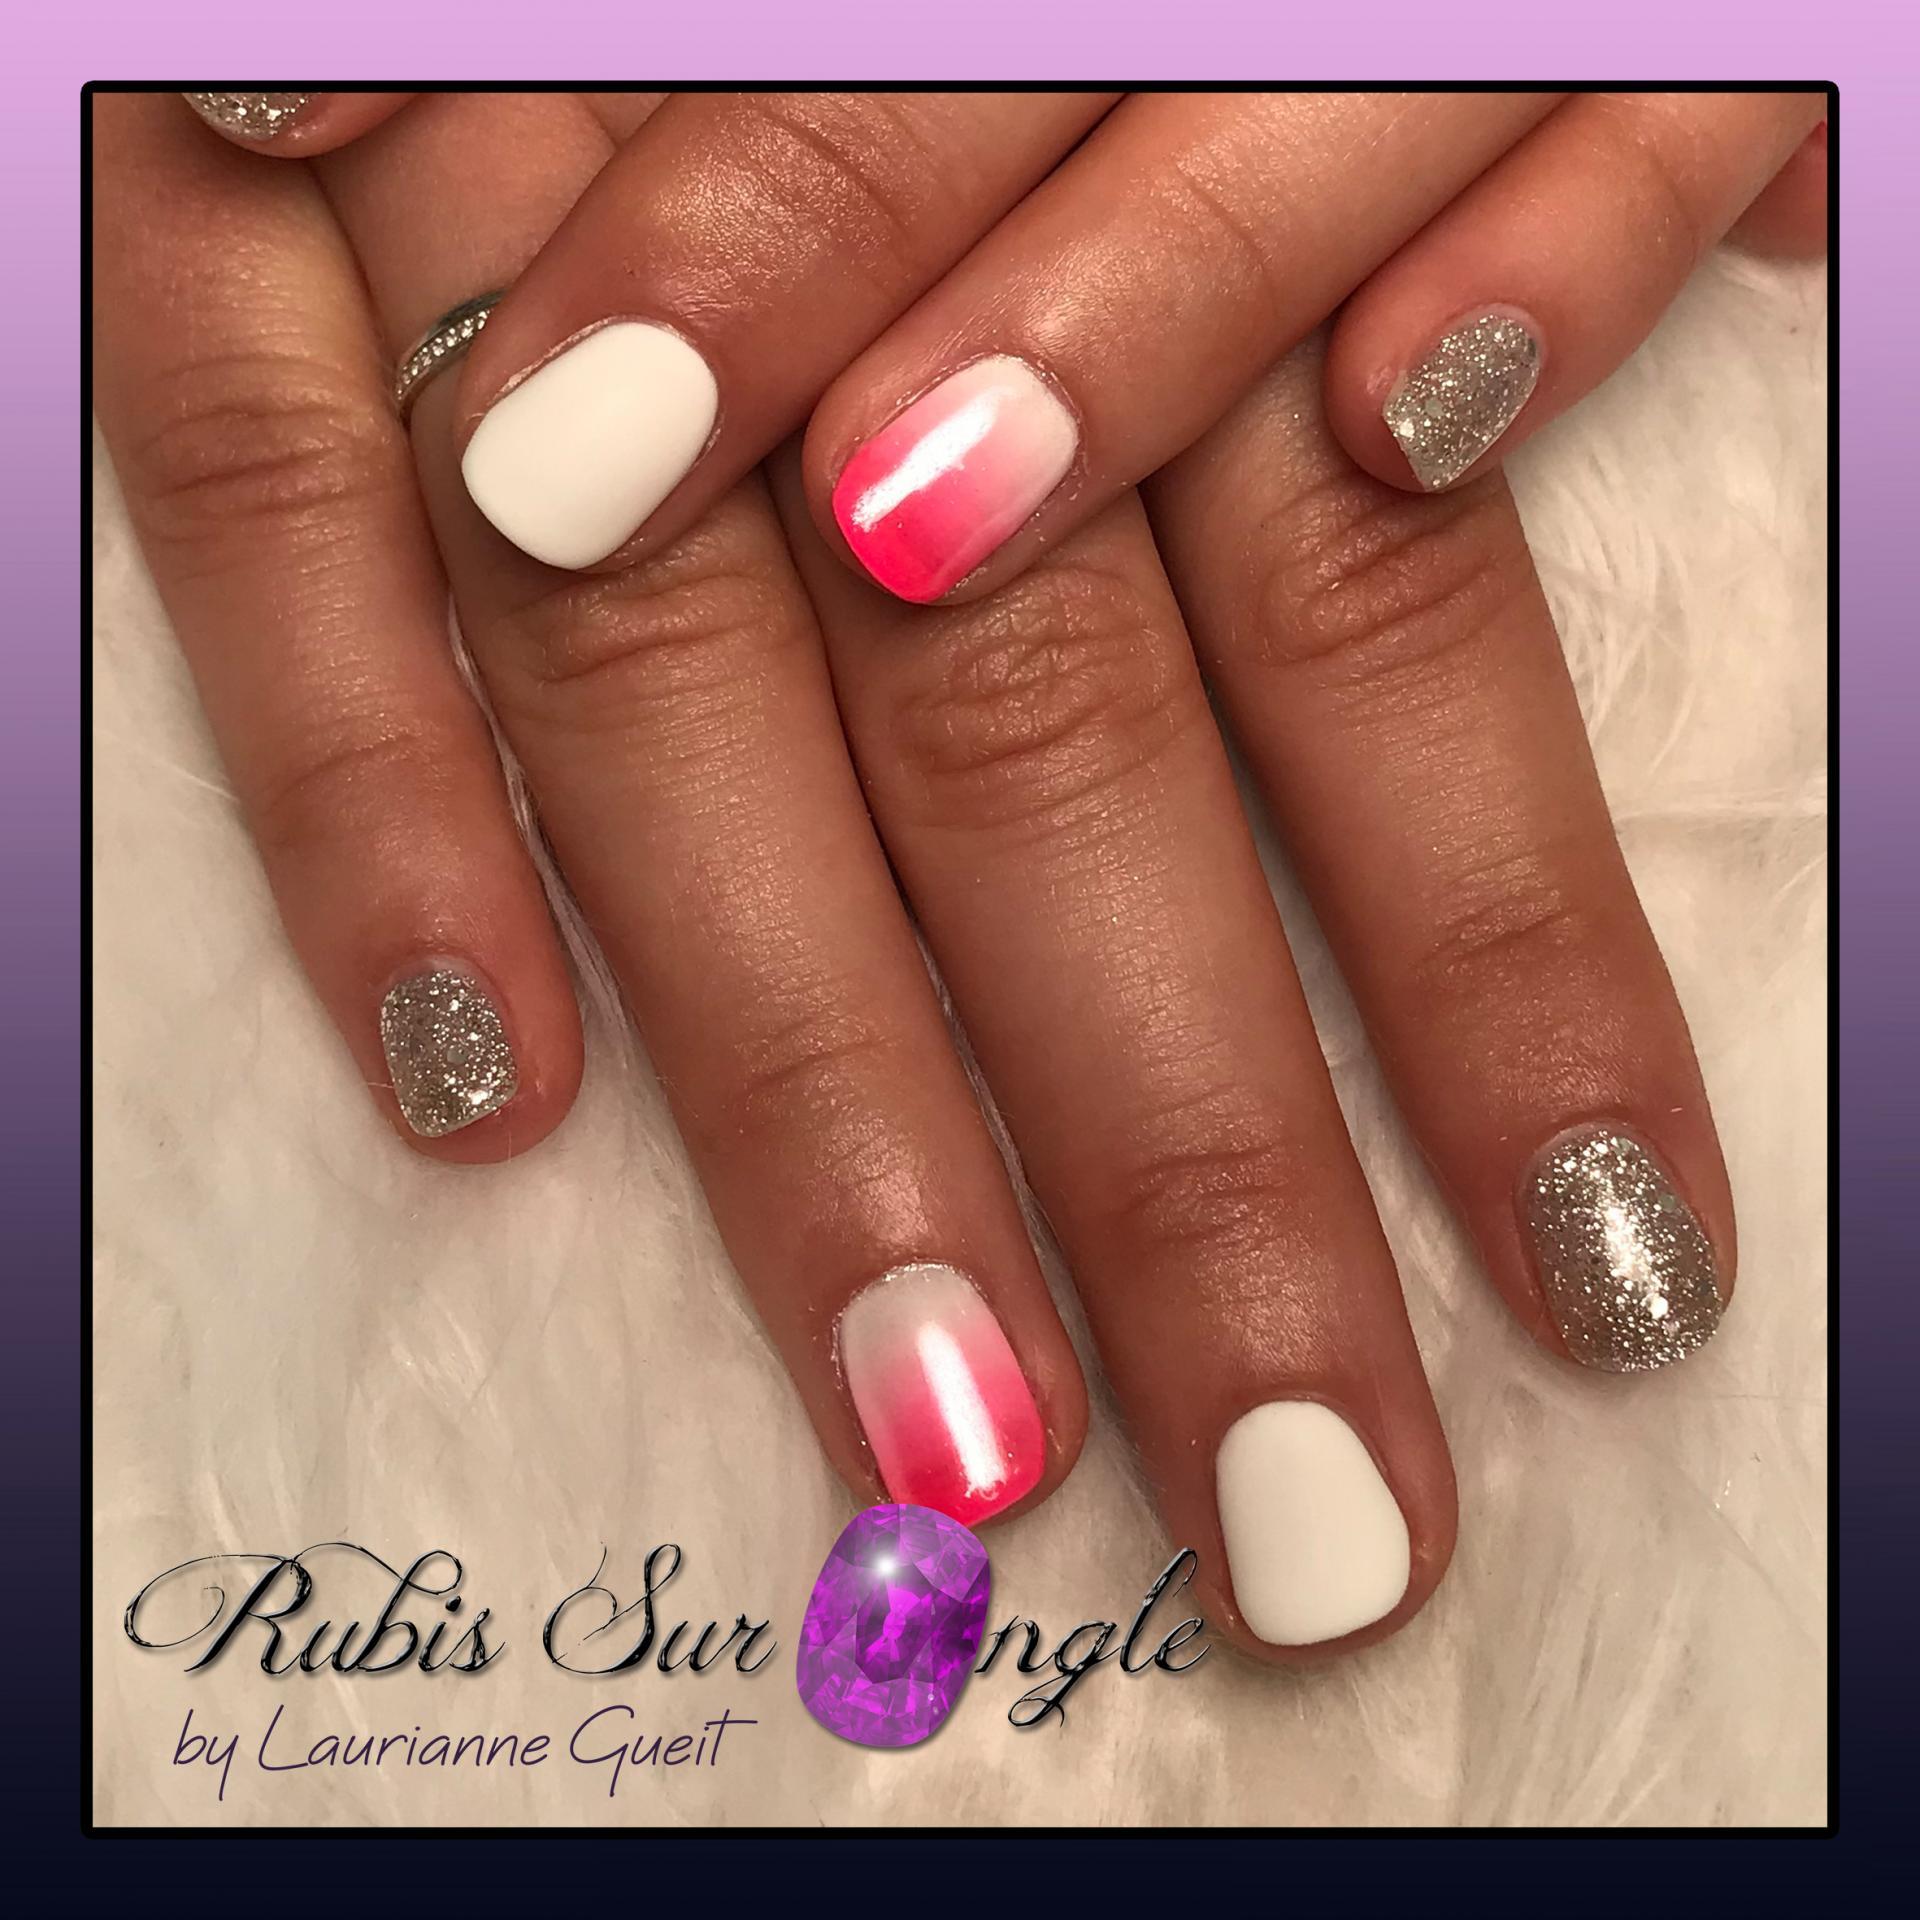 Rubis-Sur-Ongle-Nail-Art-Degrade-Rose-Blanc-Argente